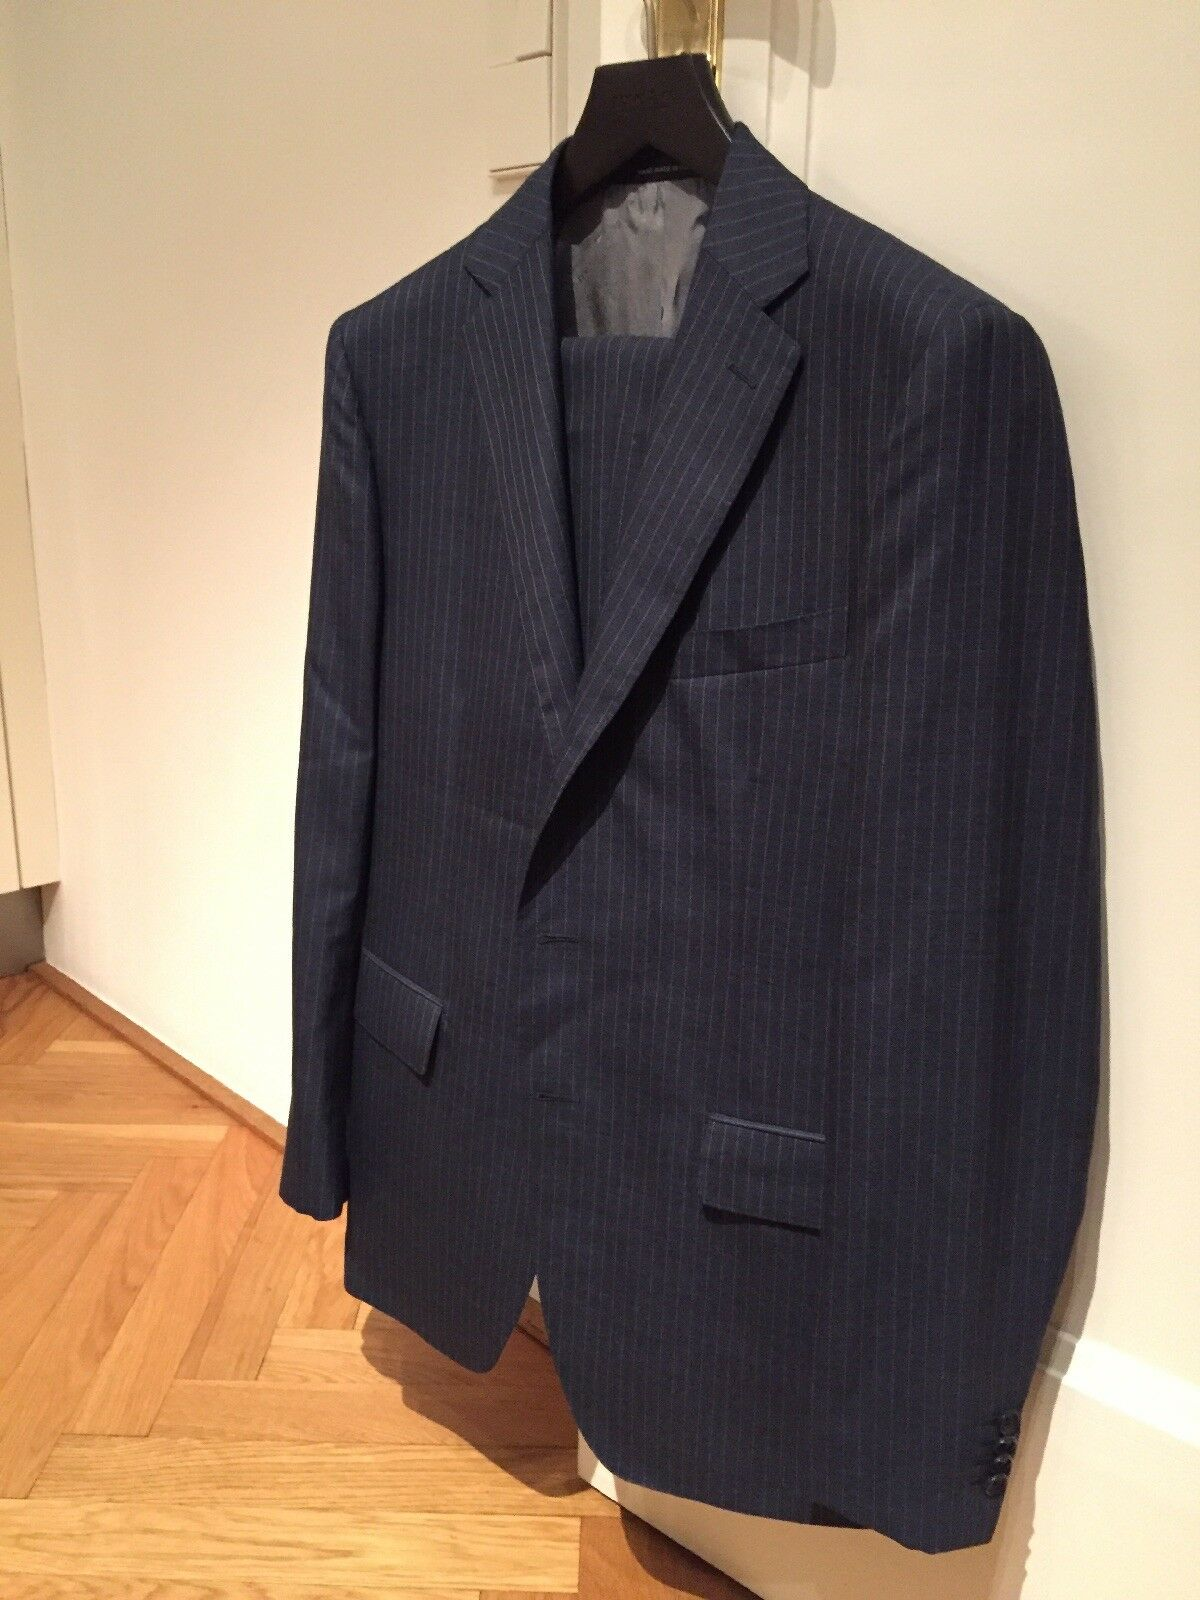 CARUSO, hand made in , Kreidestreifen-Anzug, Gr. 50, blau